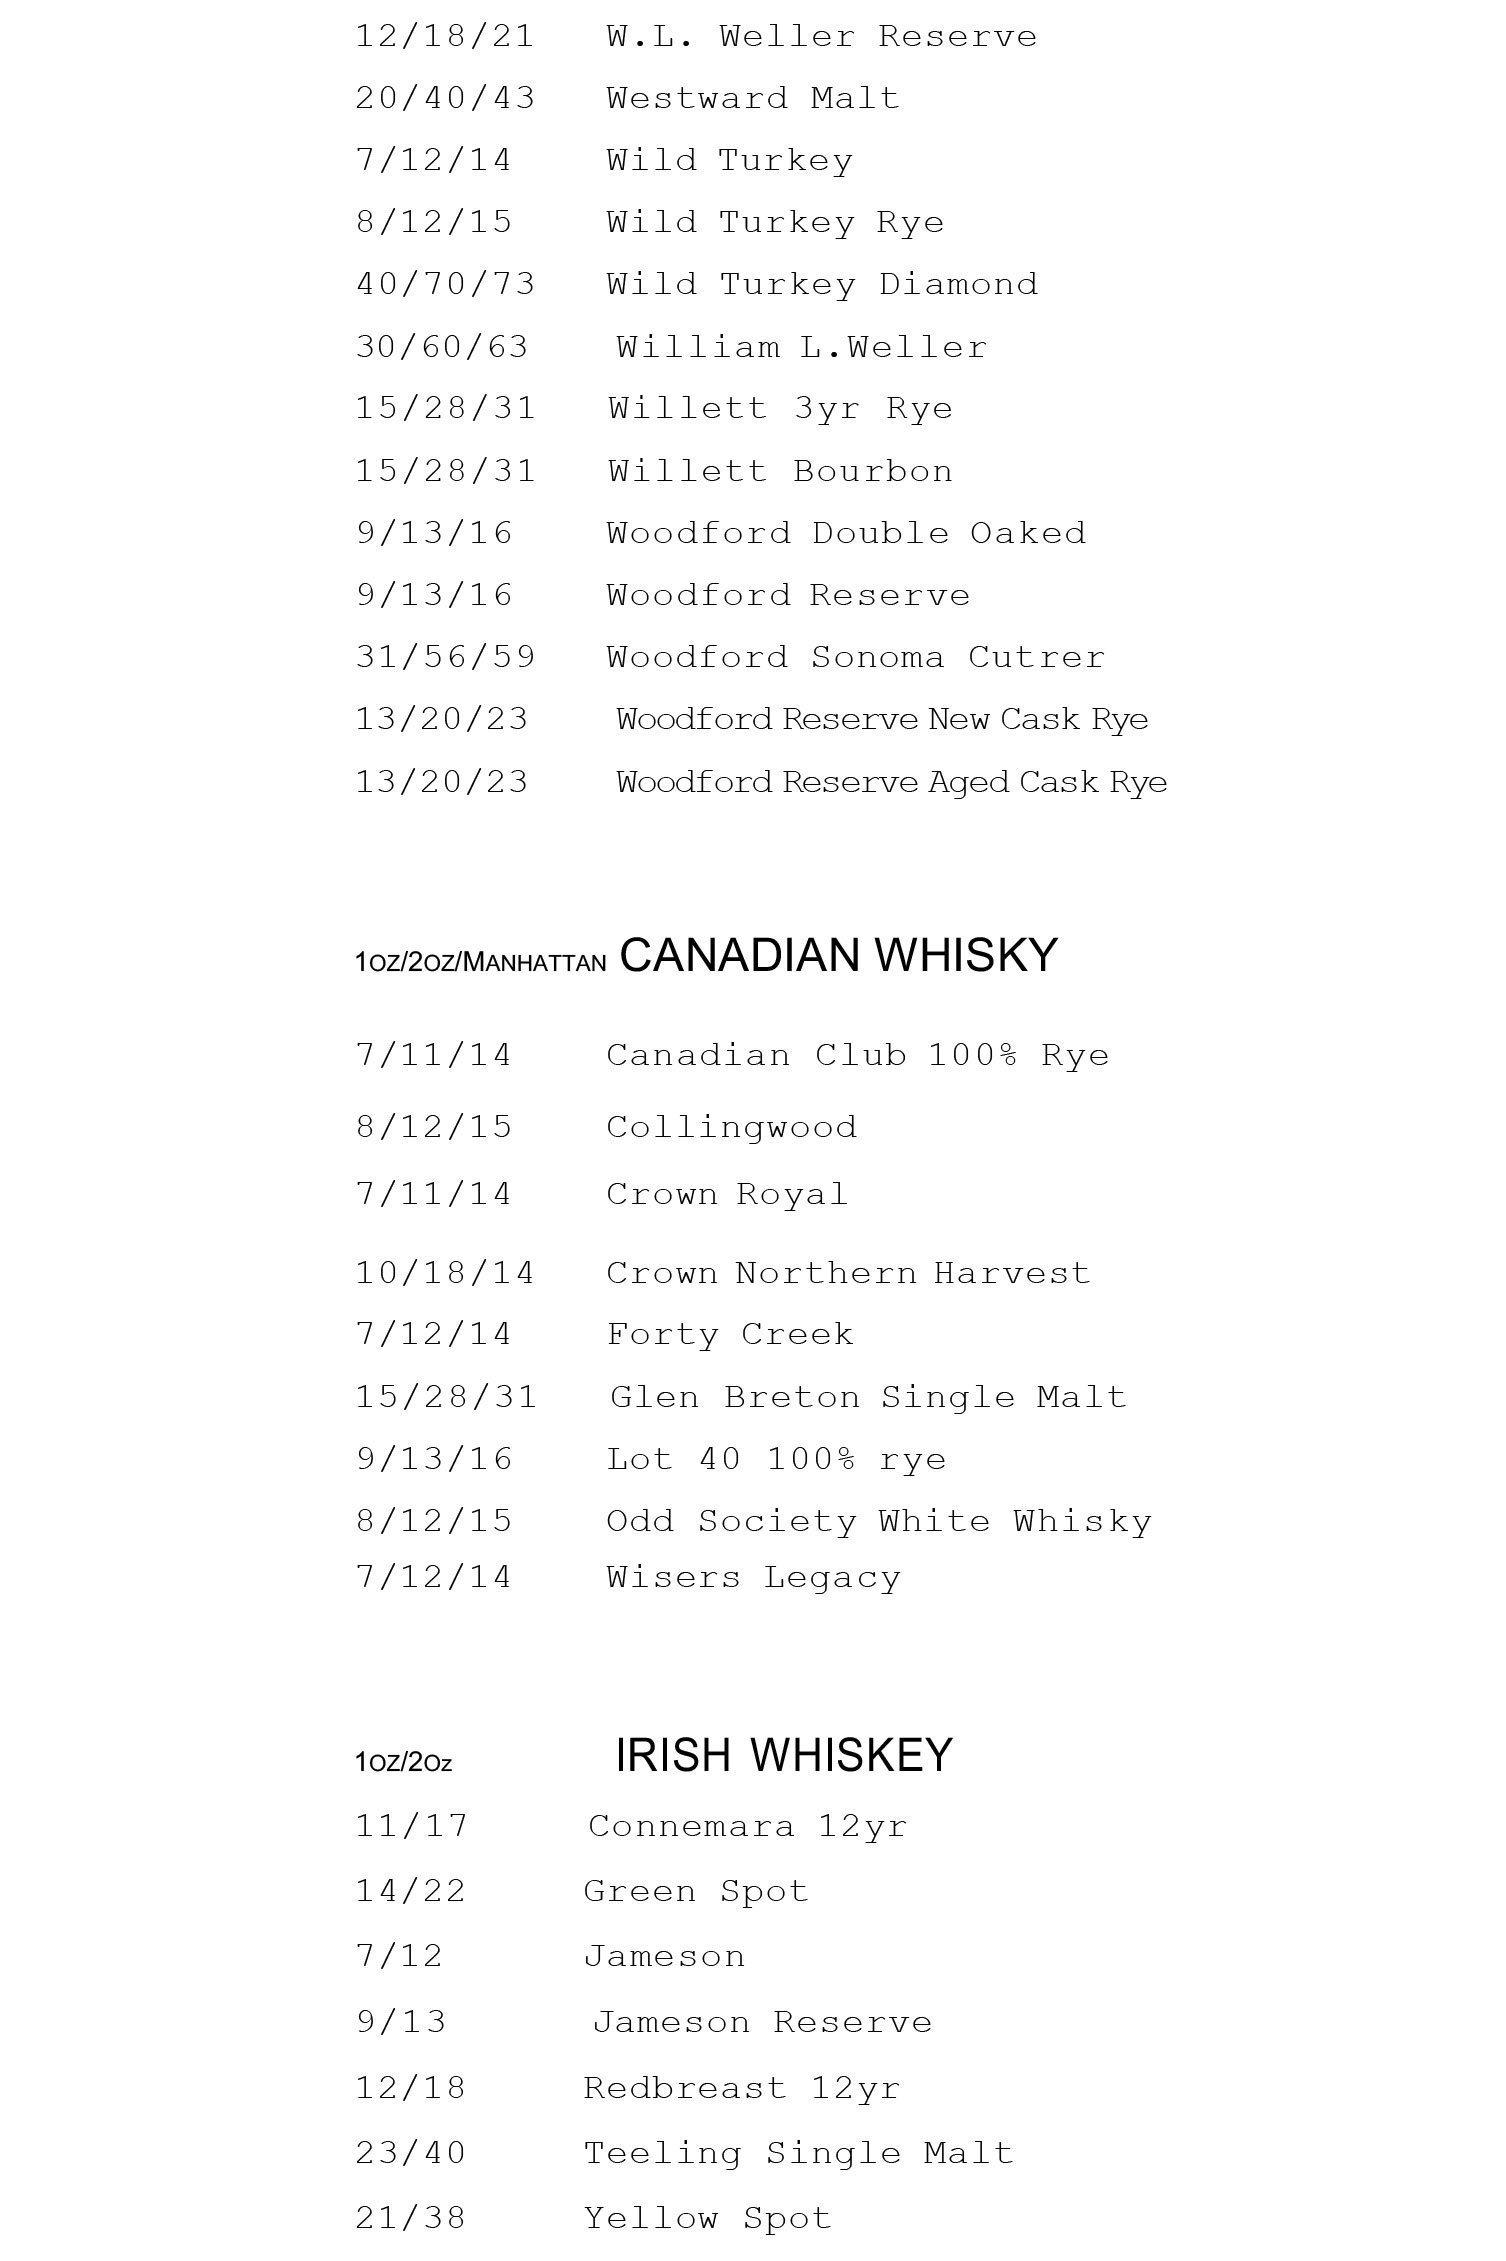 Canadian Whisky list